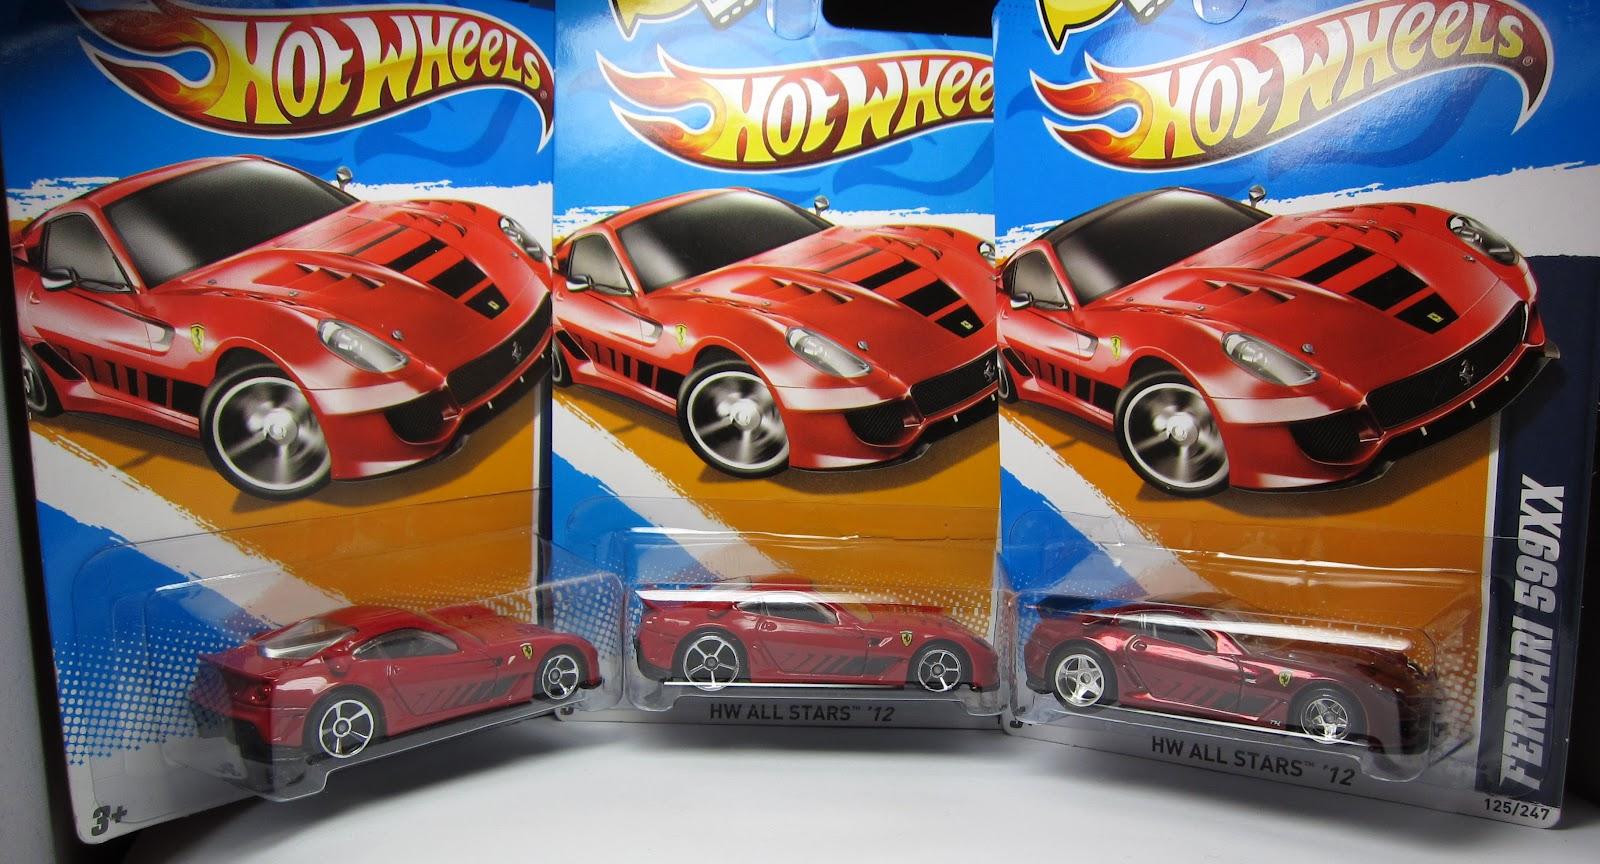 The lamley group variation alert hot wheels ferrari 599xx with oh5